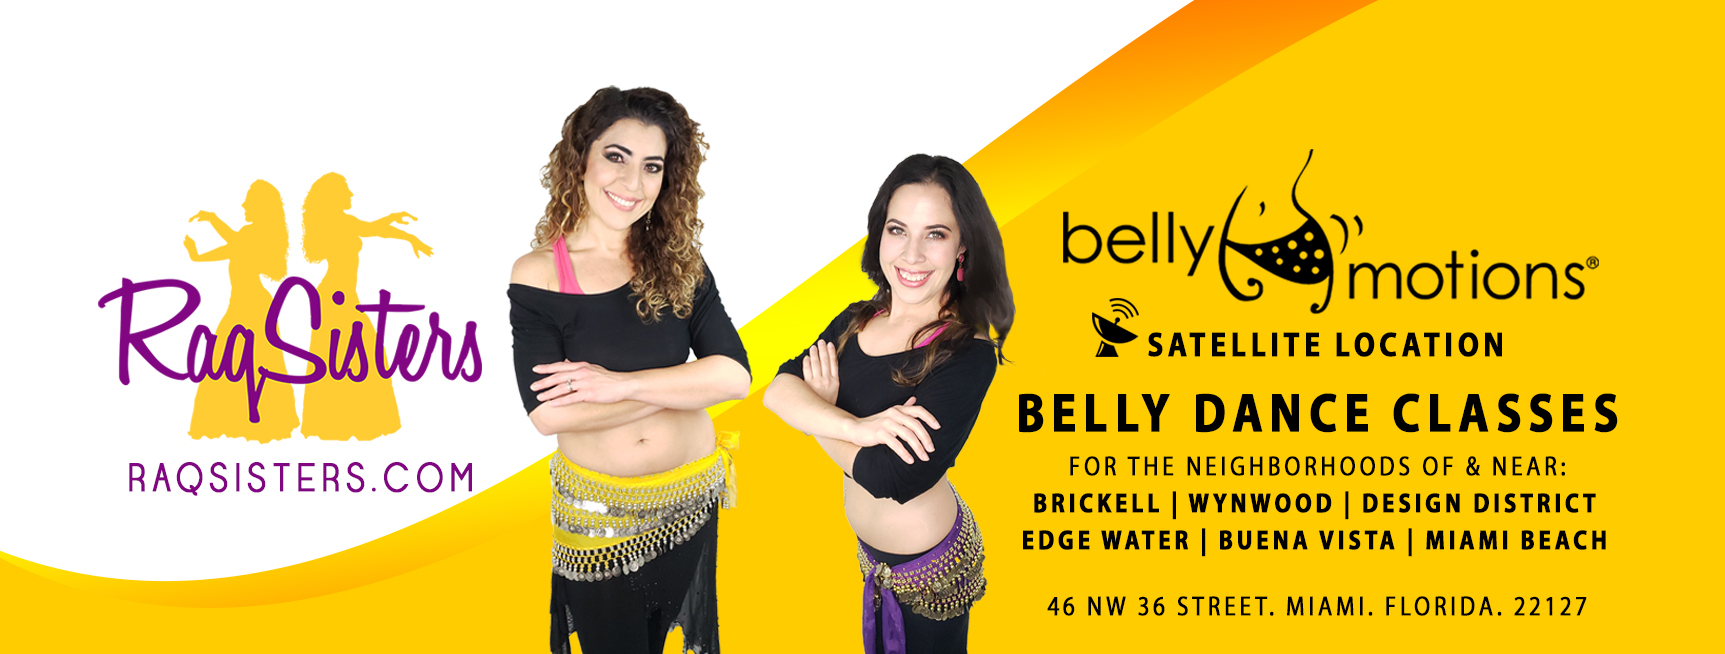 RAQSISTERS_BELLY DANCE CLASSES_MIAMI_NORTH BEACH_WYNWOOD_BRICKELL.jpg